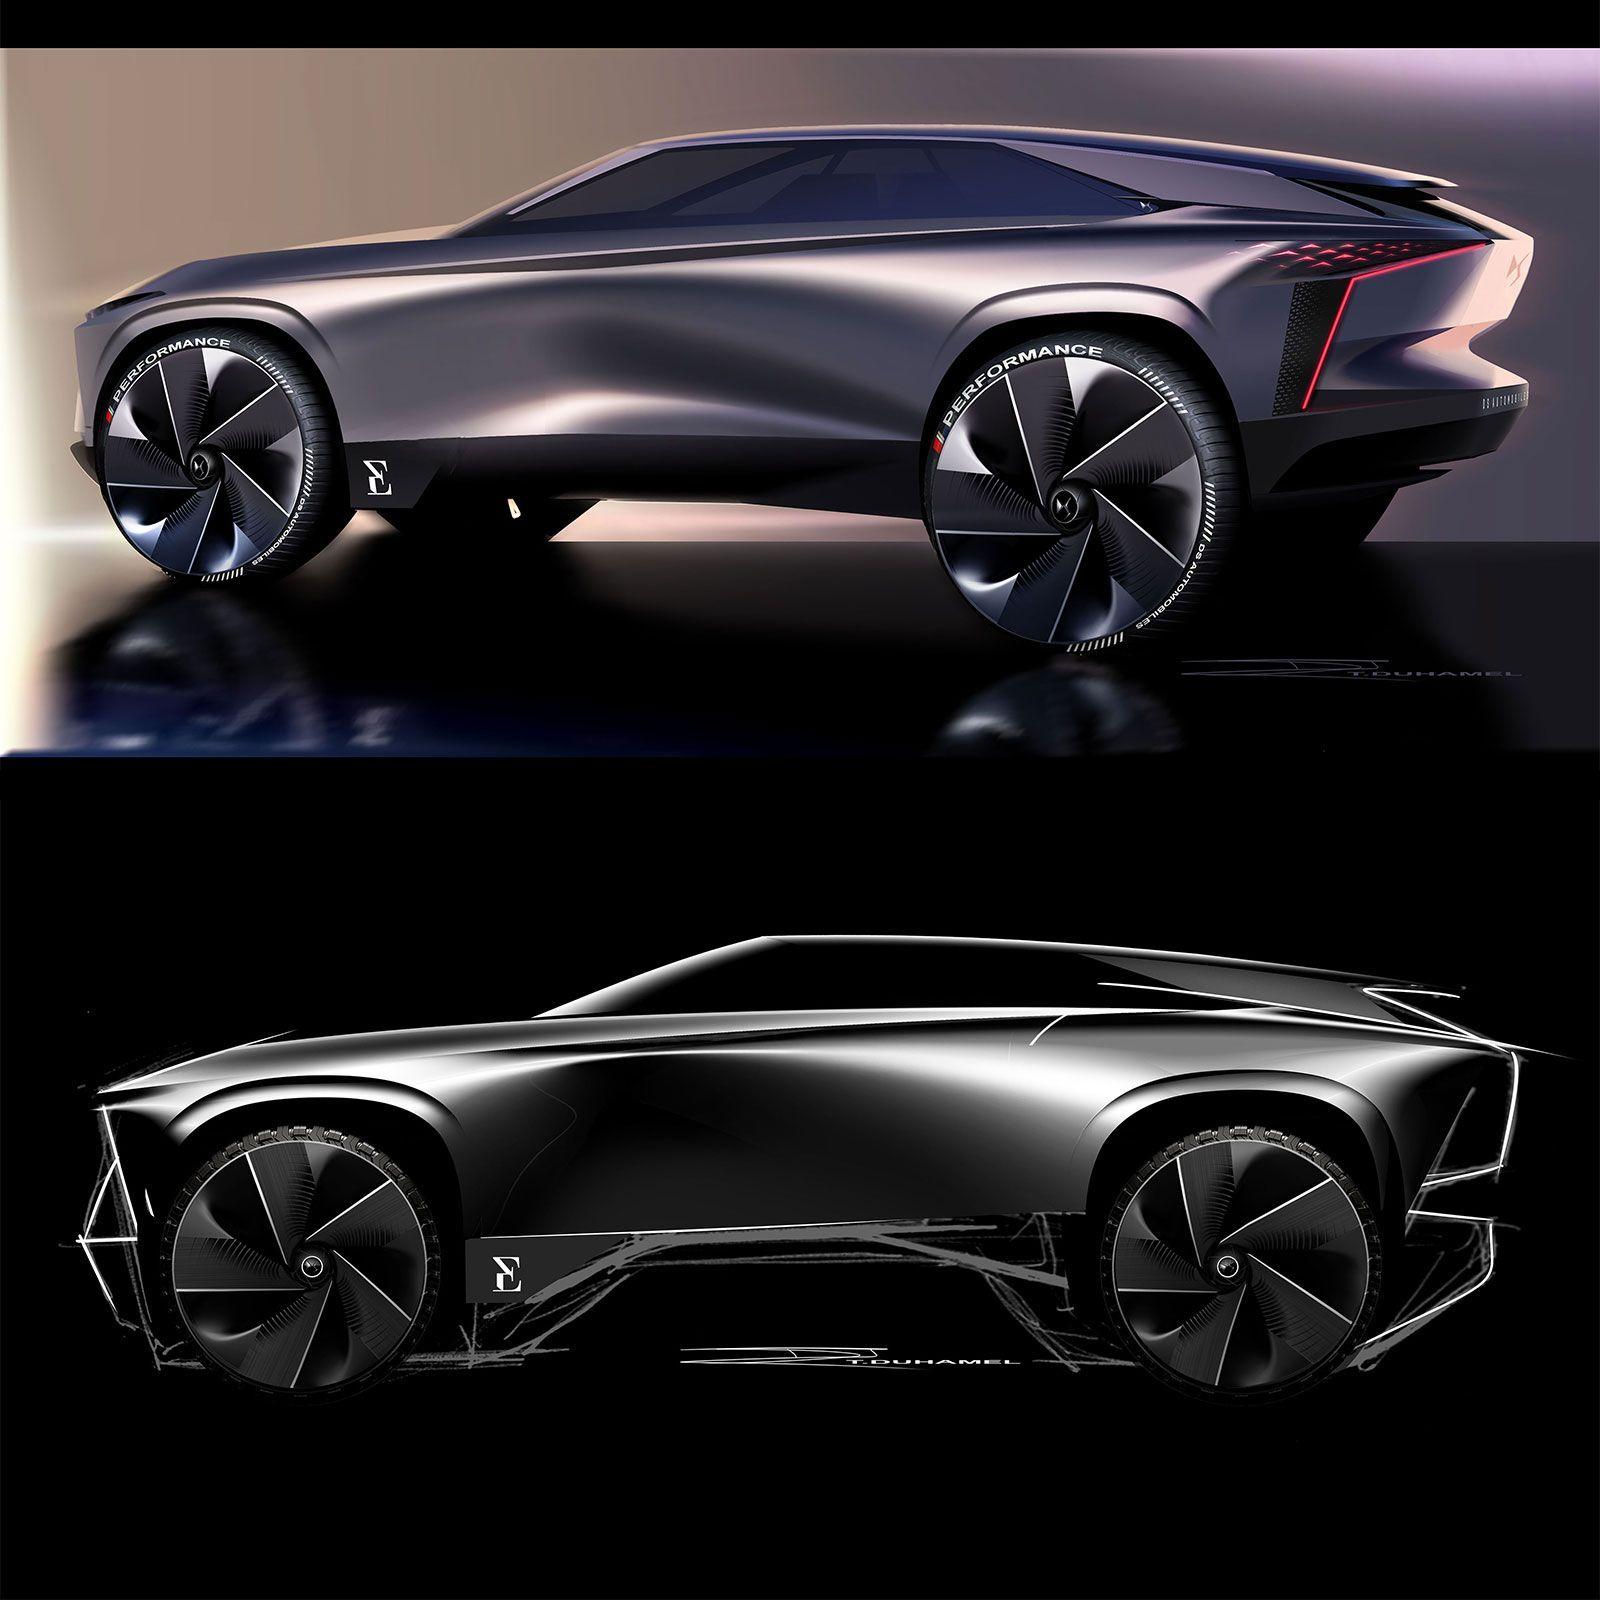 DS Aero Sport Lounge Concept   #DSautomobiles #ConceptCar #cardesign #automotivedesign #autodesign #cardesignworld #cardesignercommunity #cardesignpro #carbodydesign #cardesigner #vehicledesign #conceptcars #cardesign #futuristiccars #design #futuristic #autodesign #automotive #car #cargram #industrialdesignsketch #carrendering